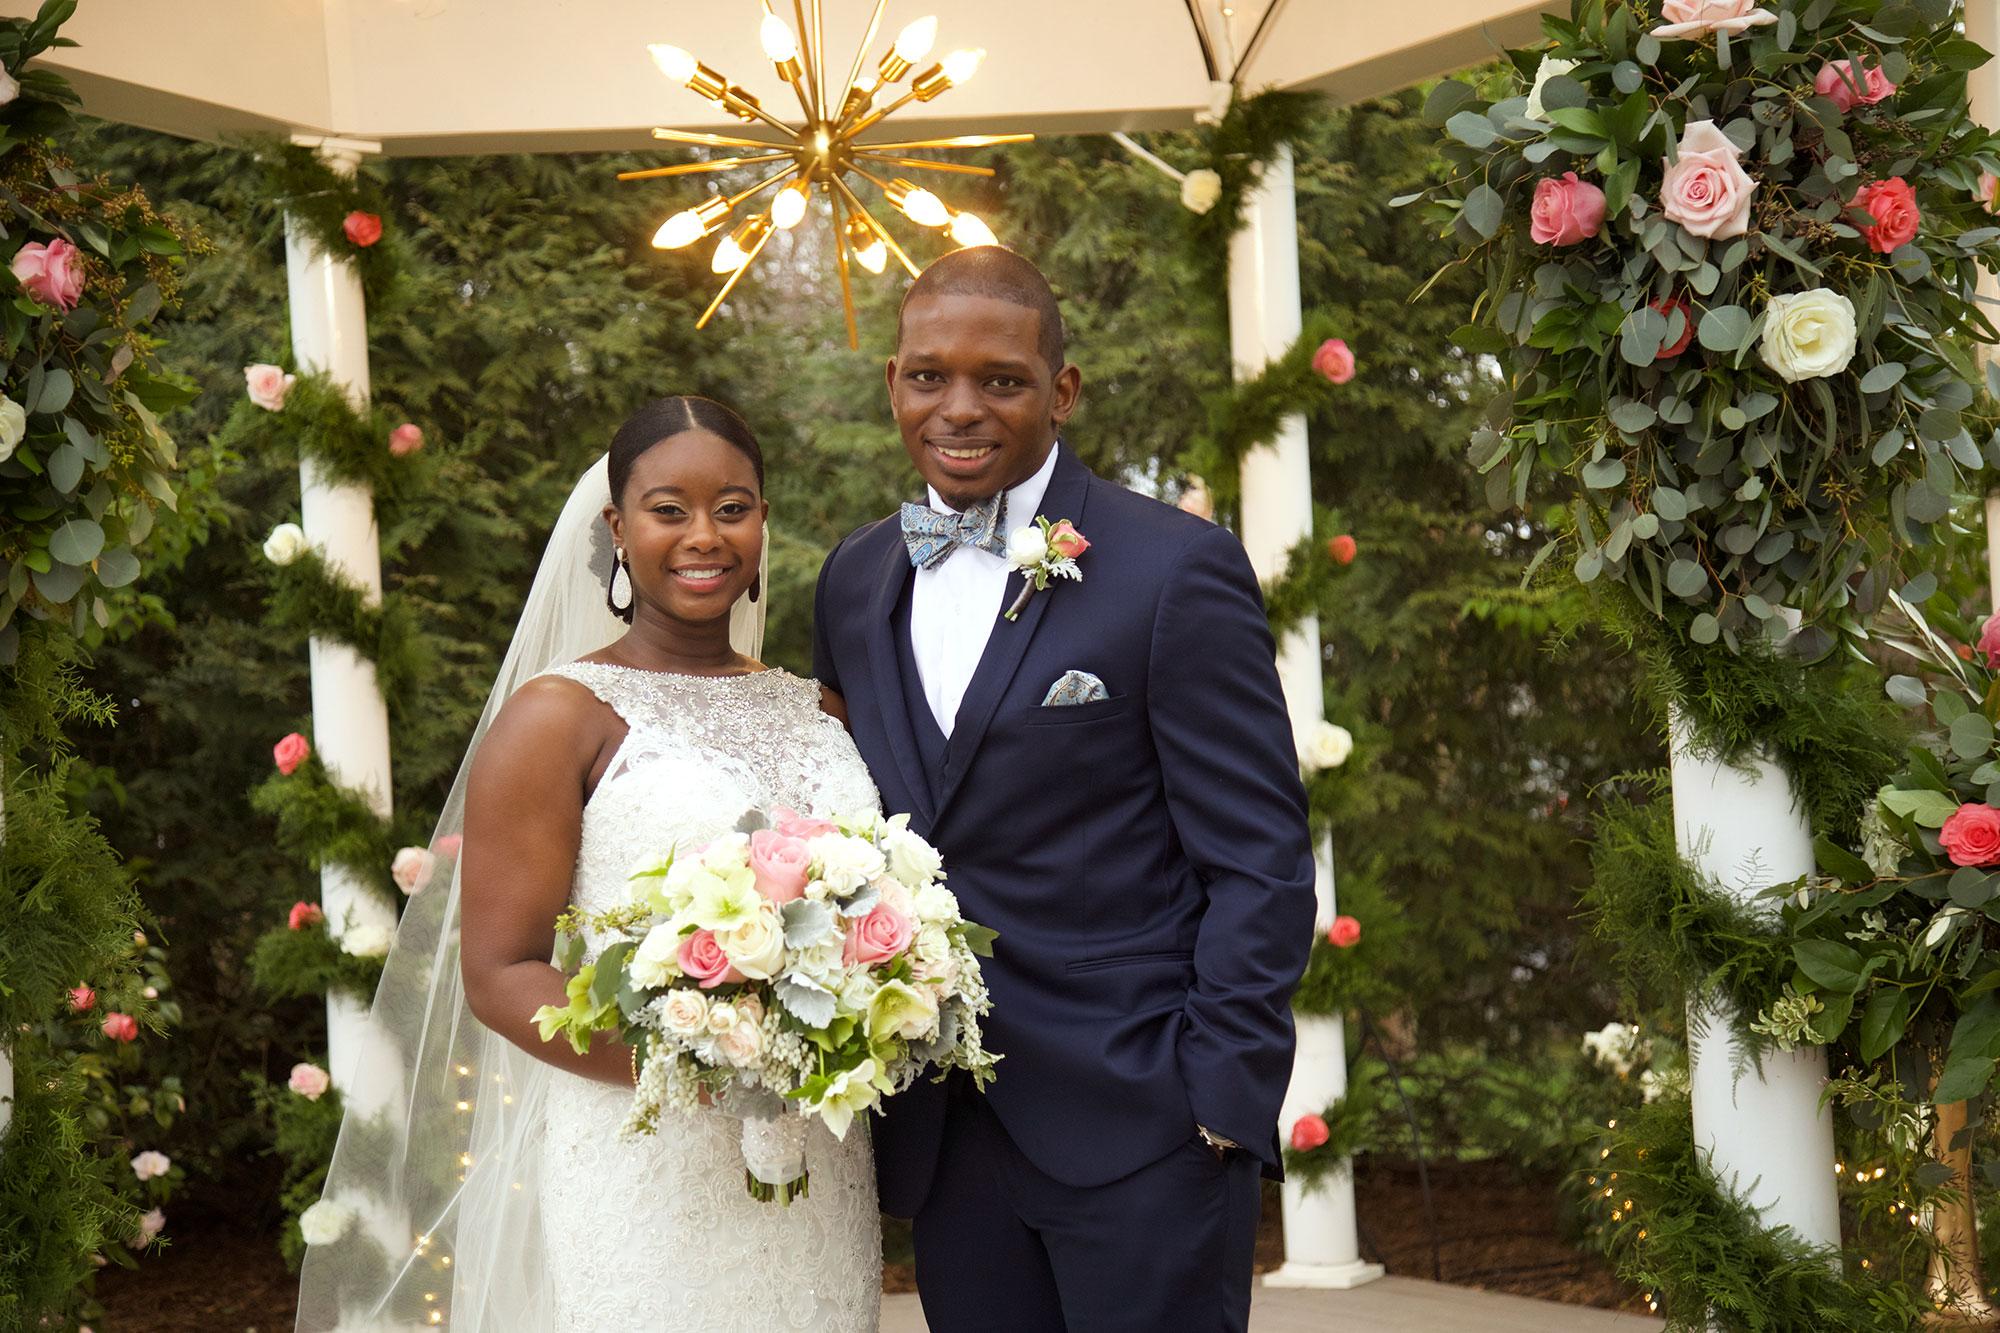 Gregory Okotie & Deonna McNeill - MAFS - Season 5 - Discussion  MAFS_S9_couple1alt